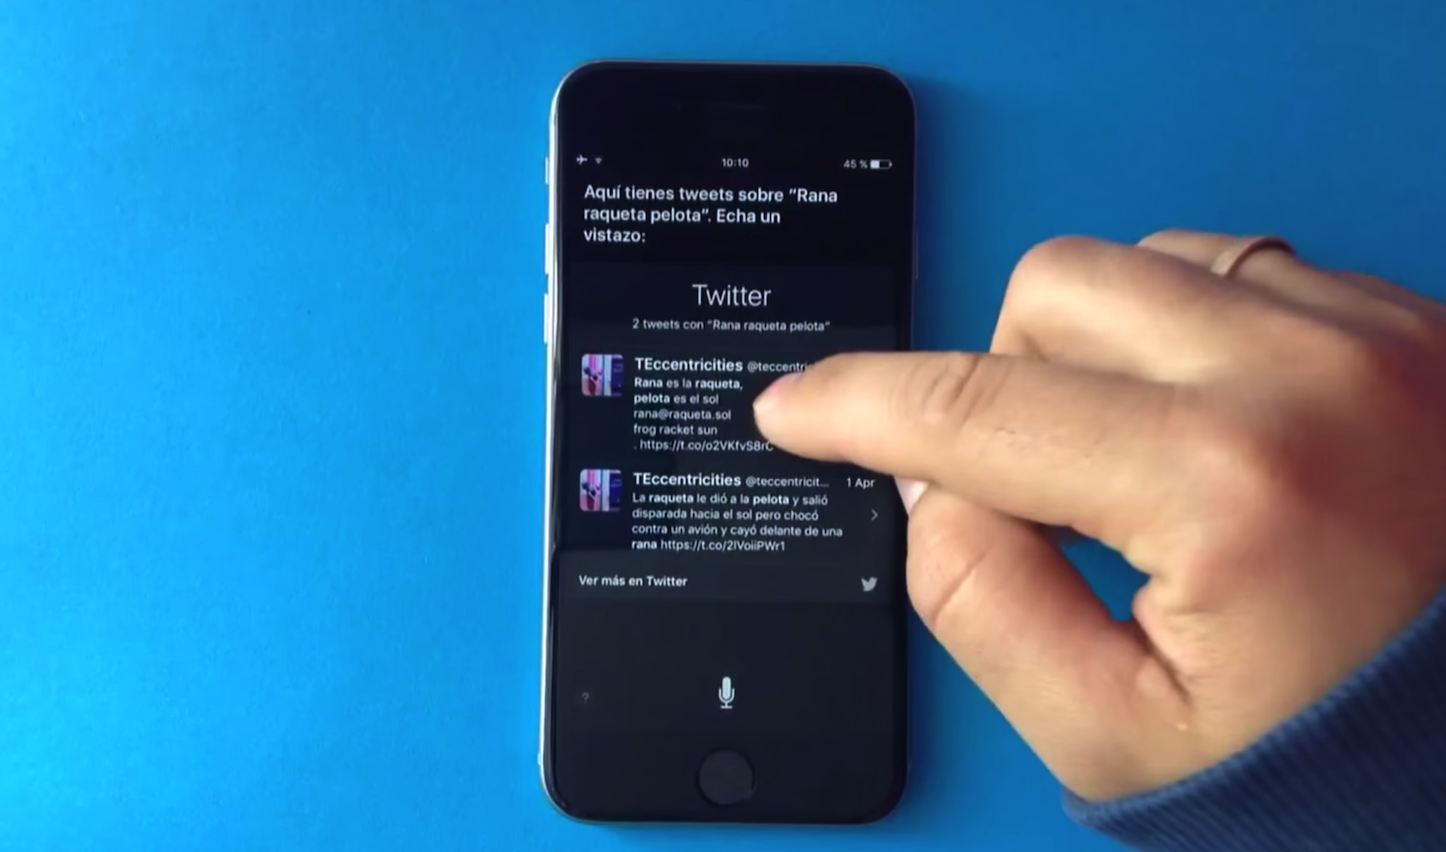 Twitter-Siri-Passcode-Access-Bug.png